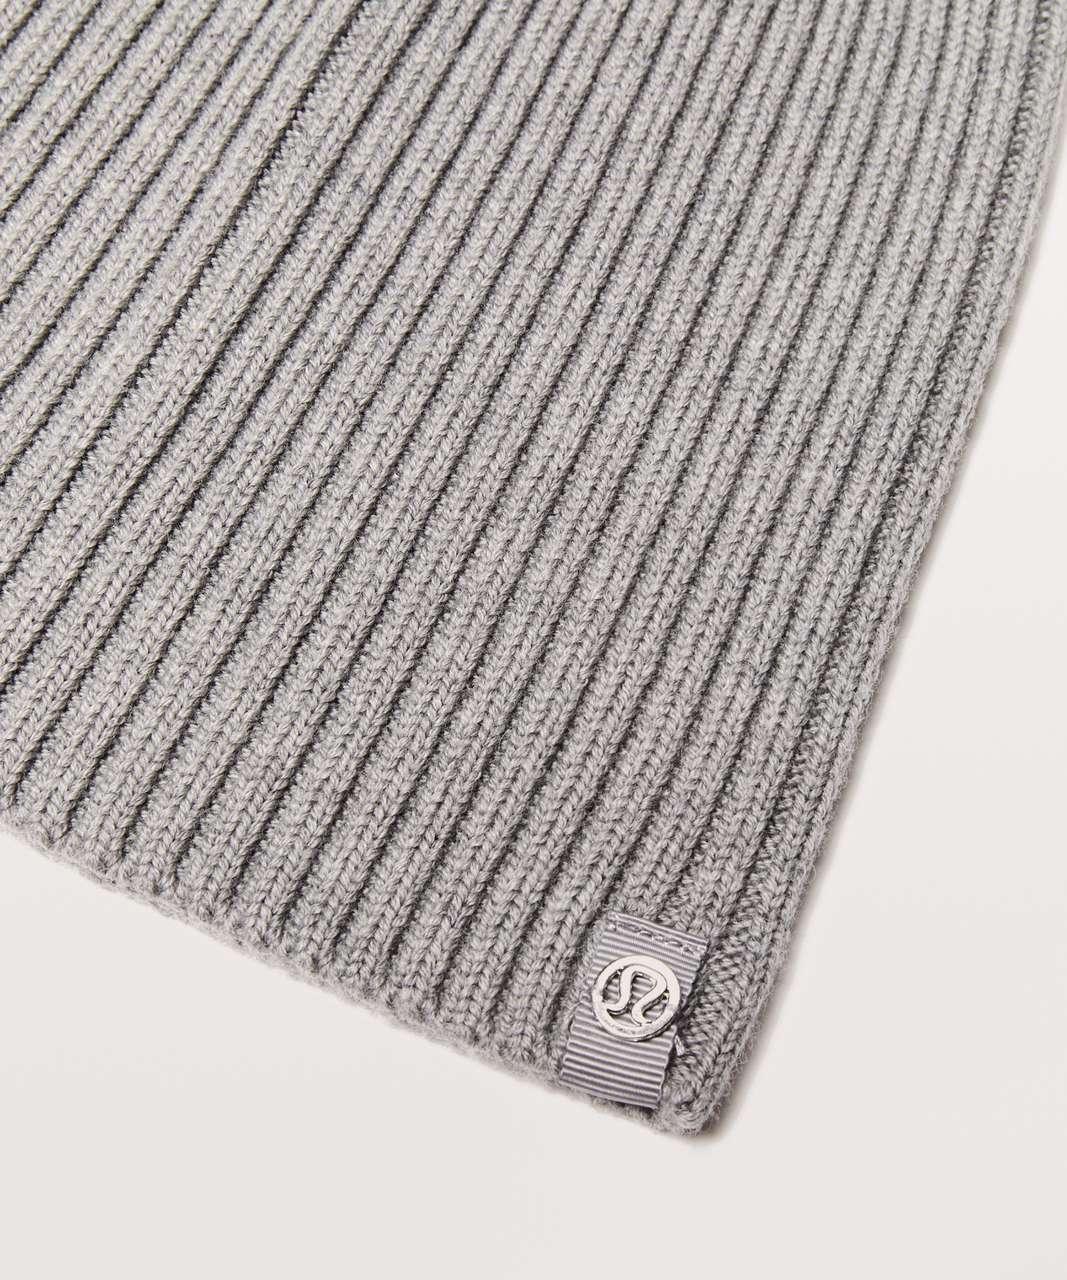 Lululemon Wool Be Cozy Toque - Heathered Medium Grey